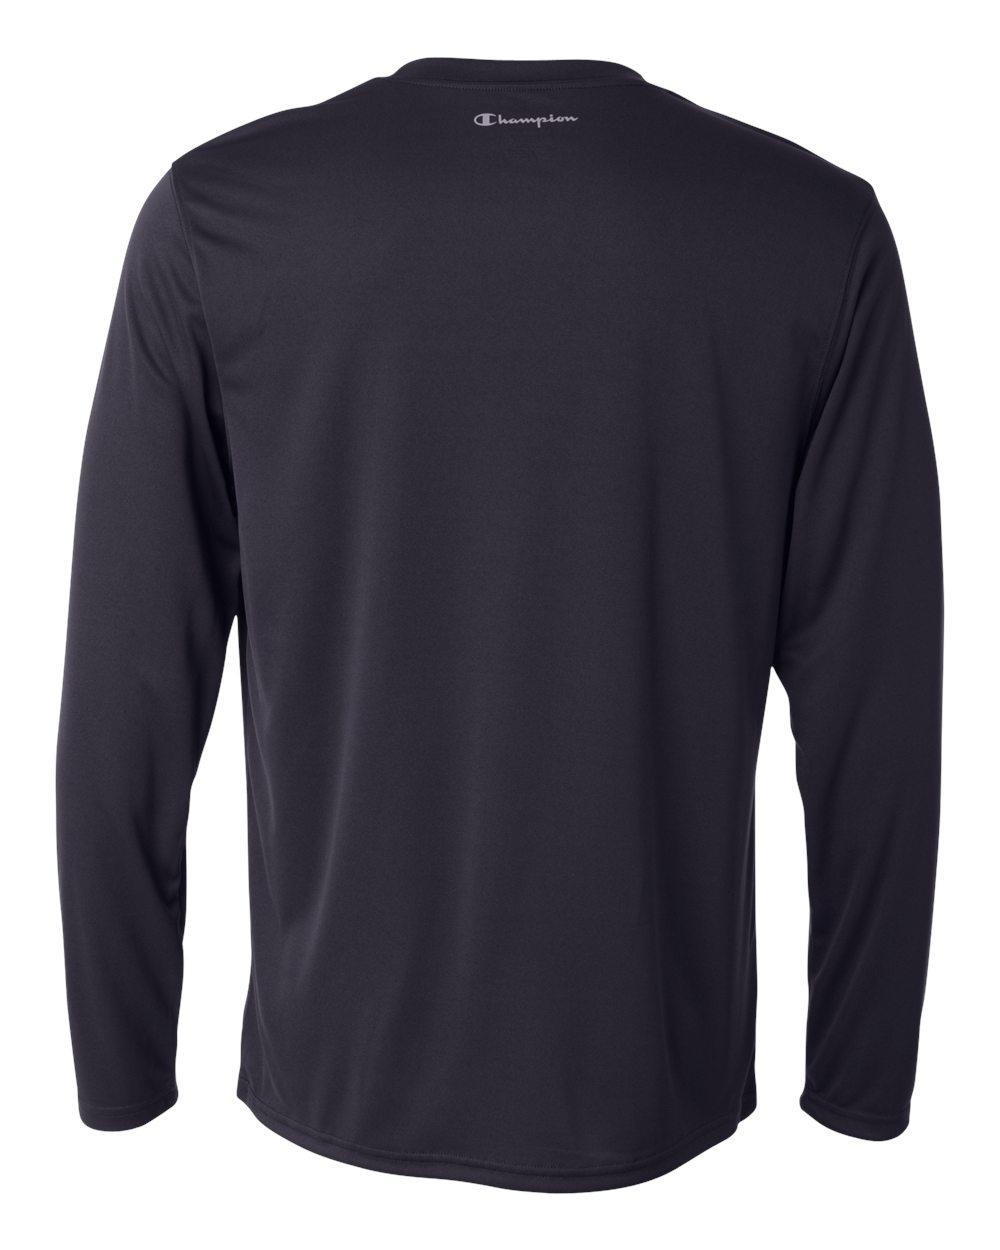 Champion-Men-039-s-Double-Dry-4-1-oz-Long-Sleeve-Interlock-T-Shirt-CW26-XS-3XL thumbnail 14